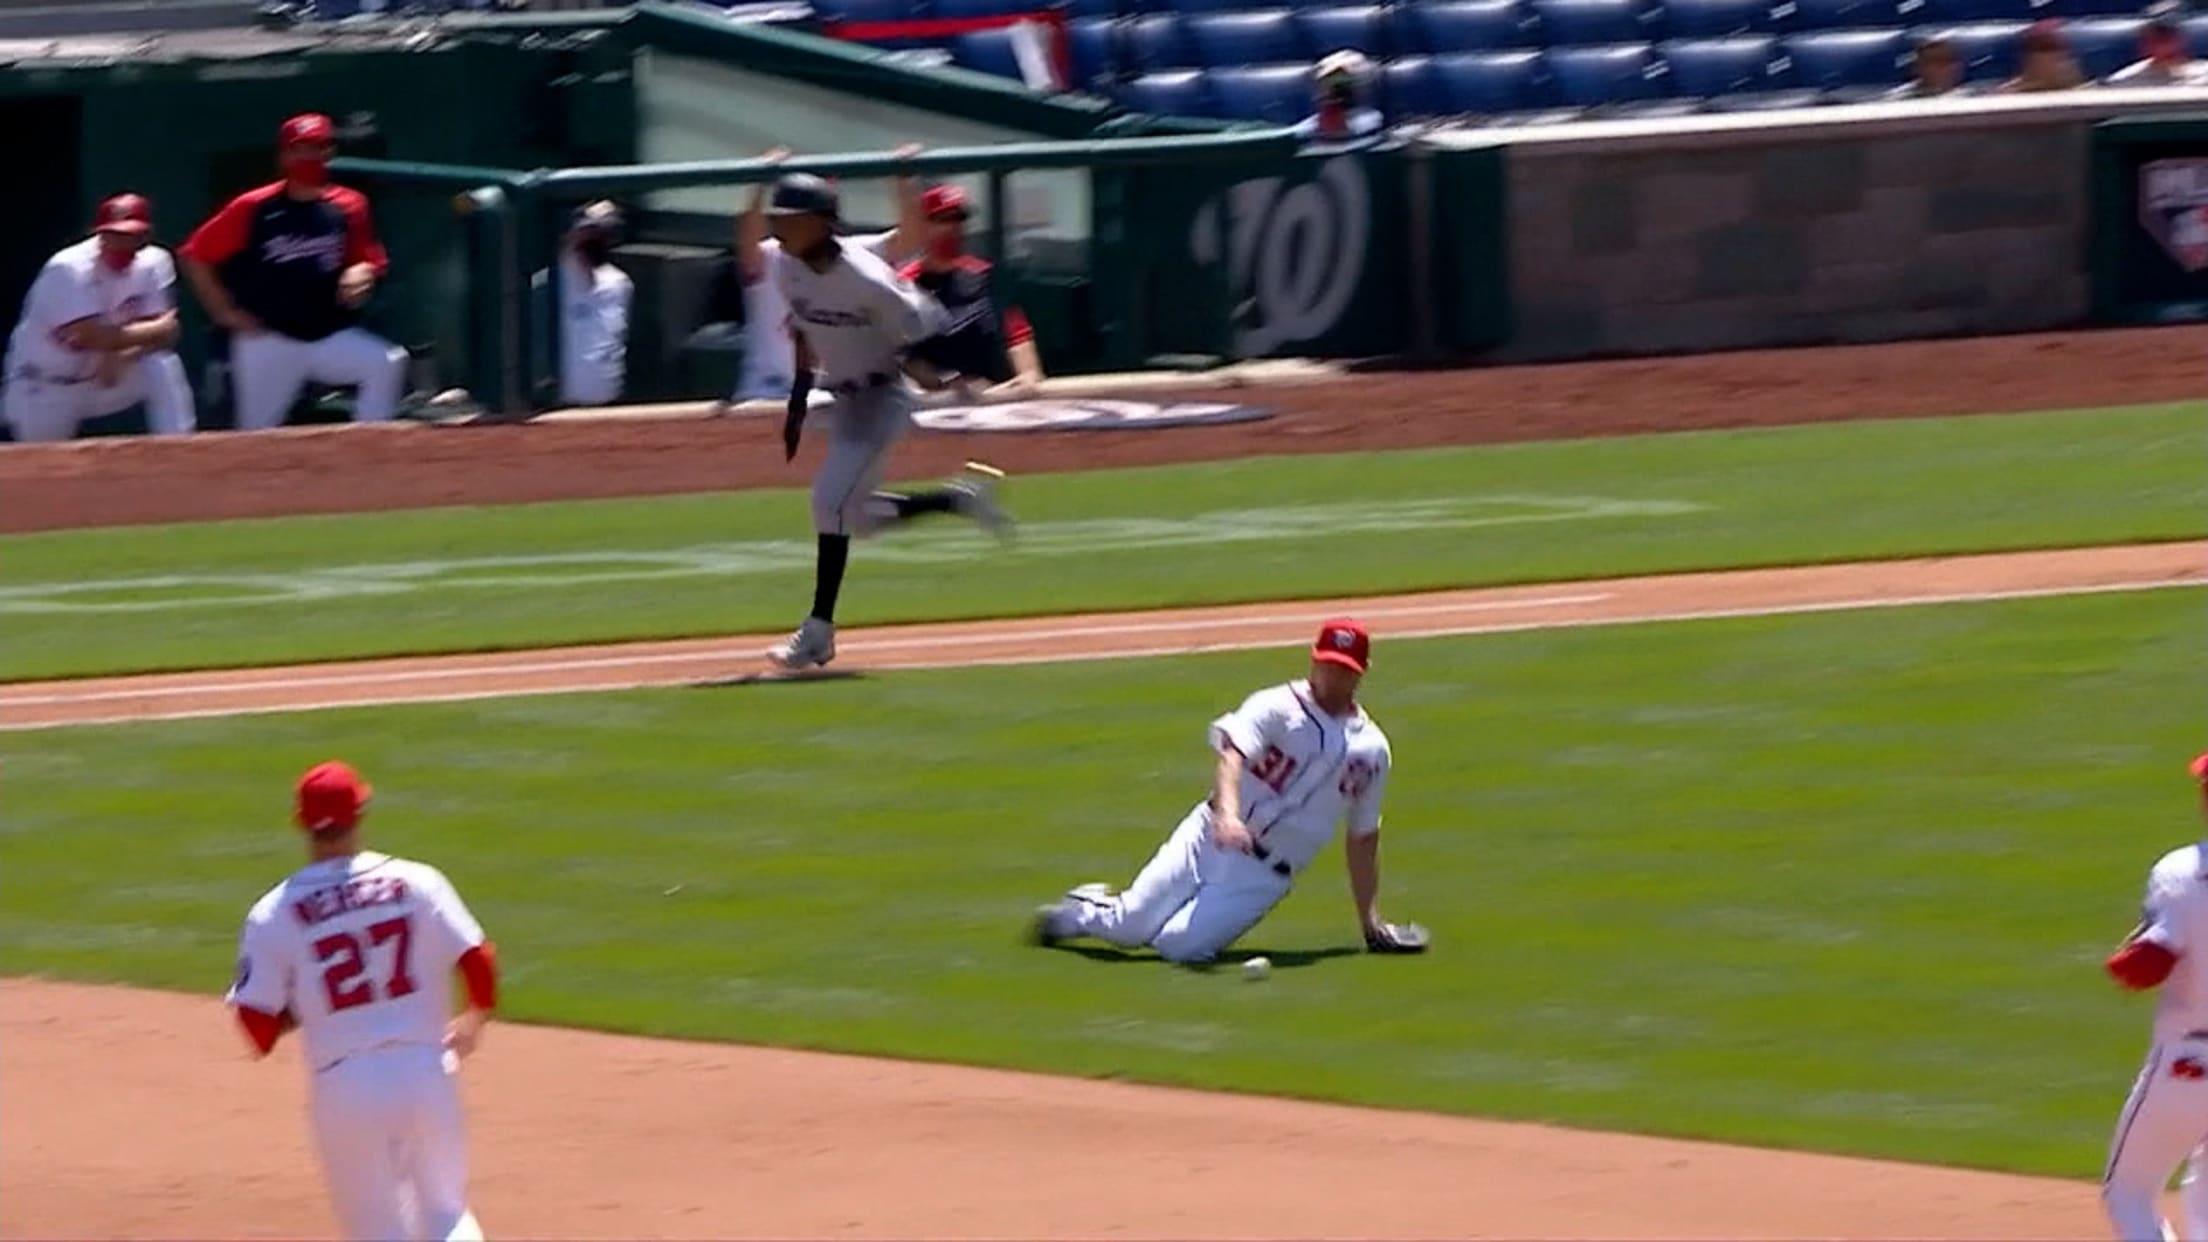 Devers' first Major League hit